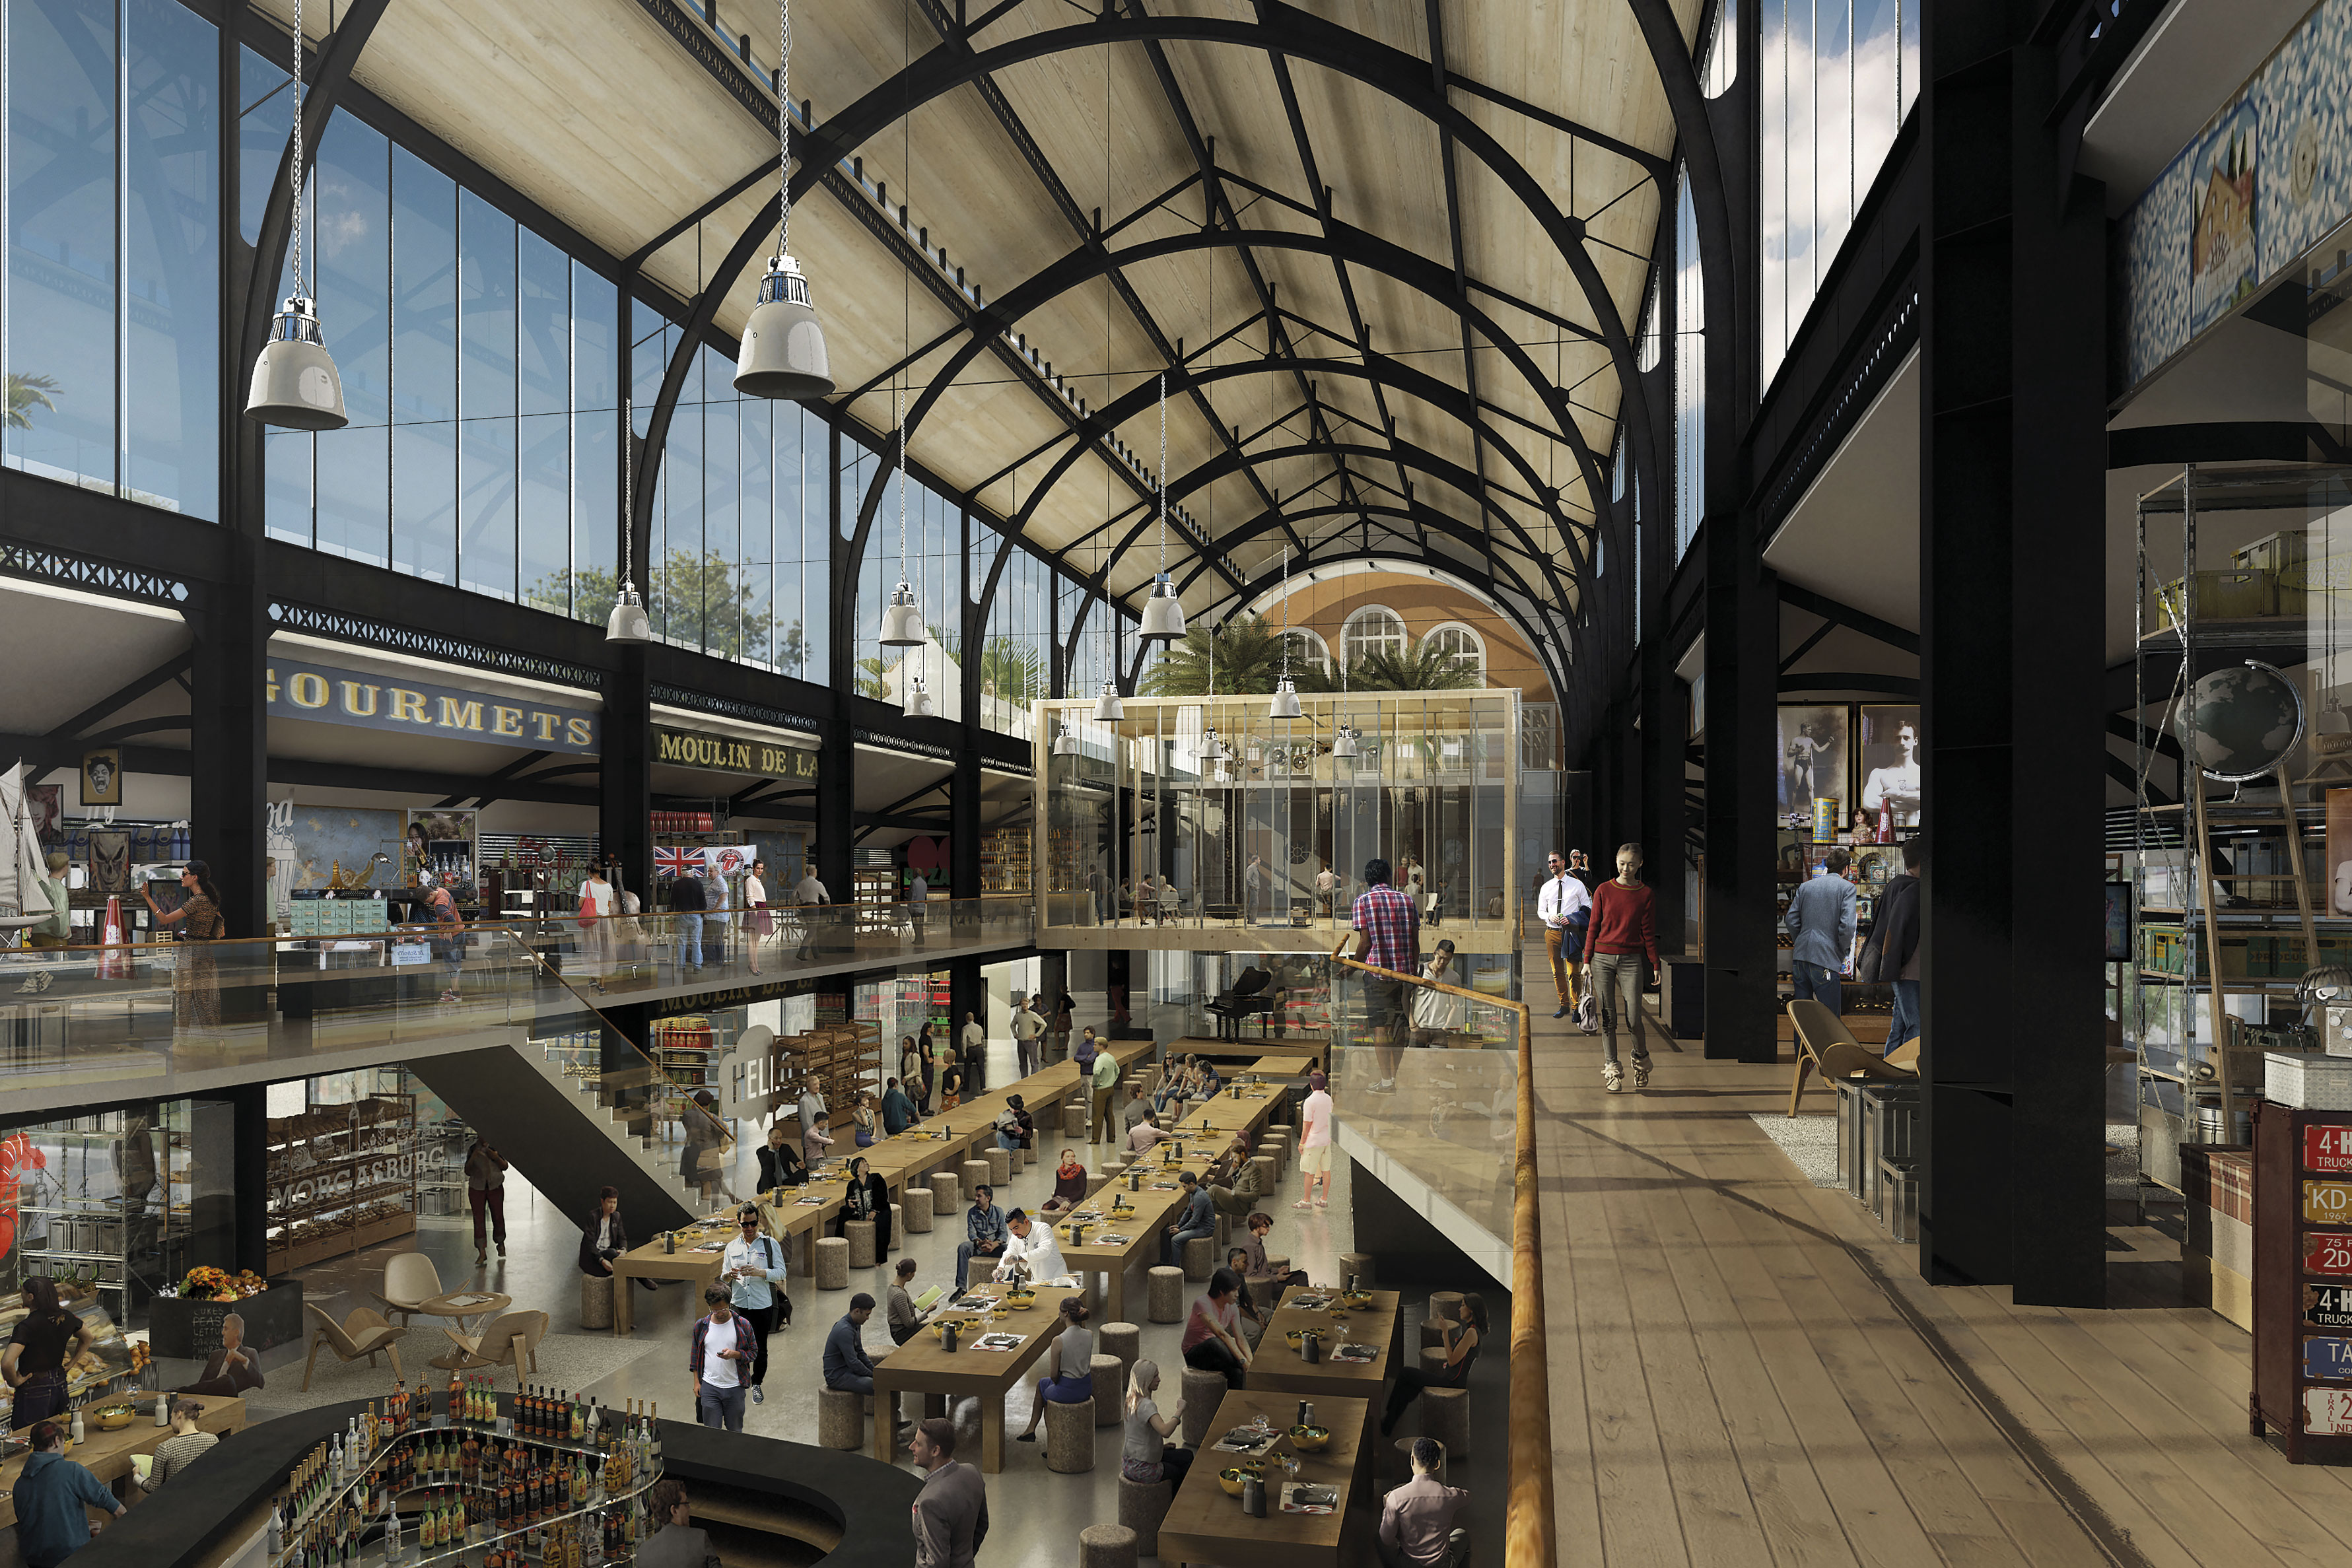 projet-urbanisme-nice-HALL-gare-des-suds-by-Banimmo-France